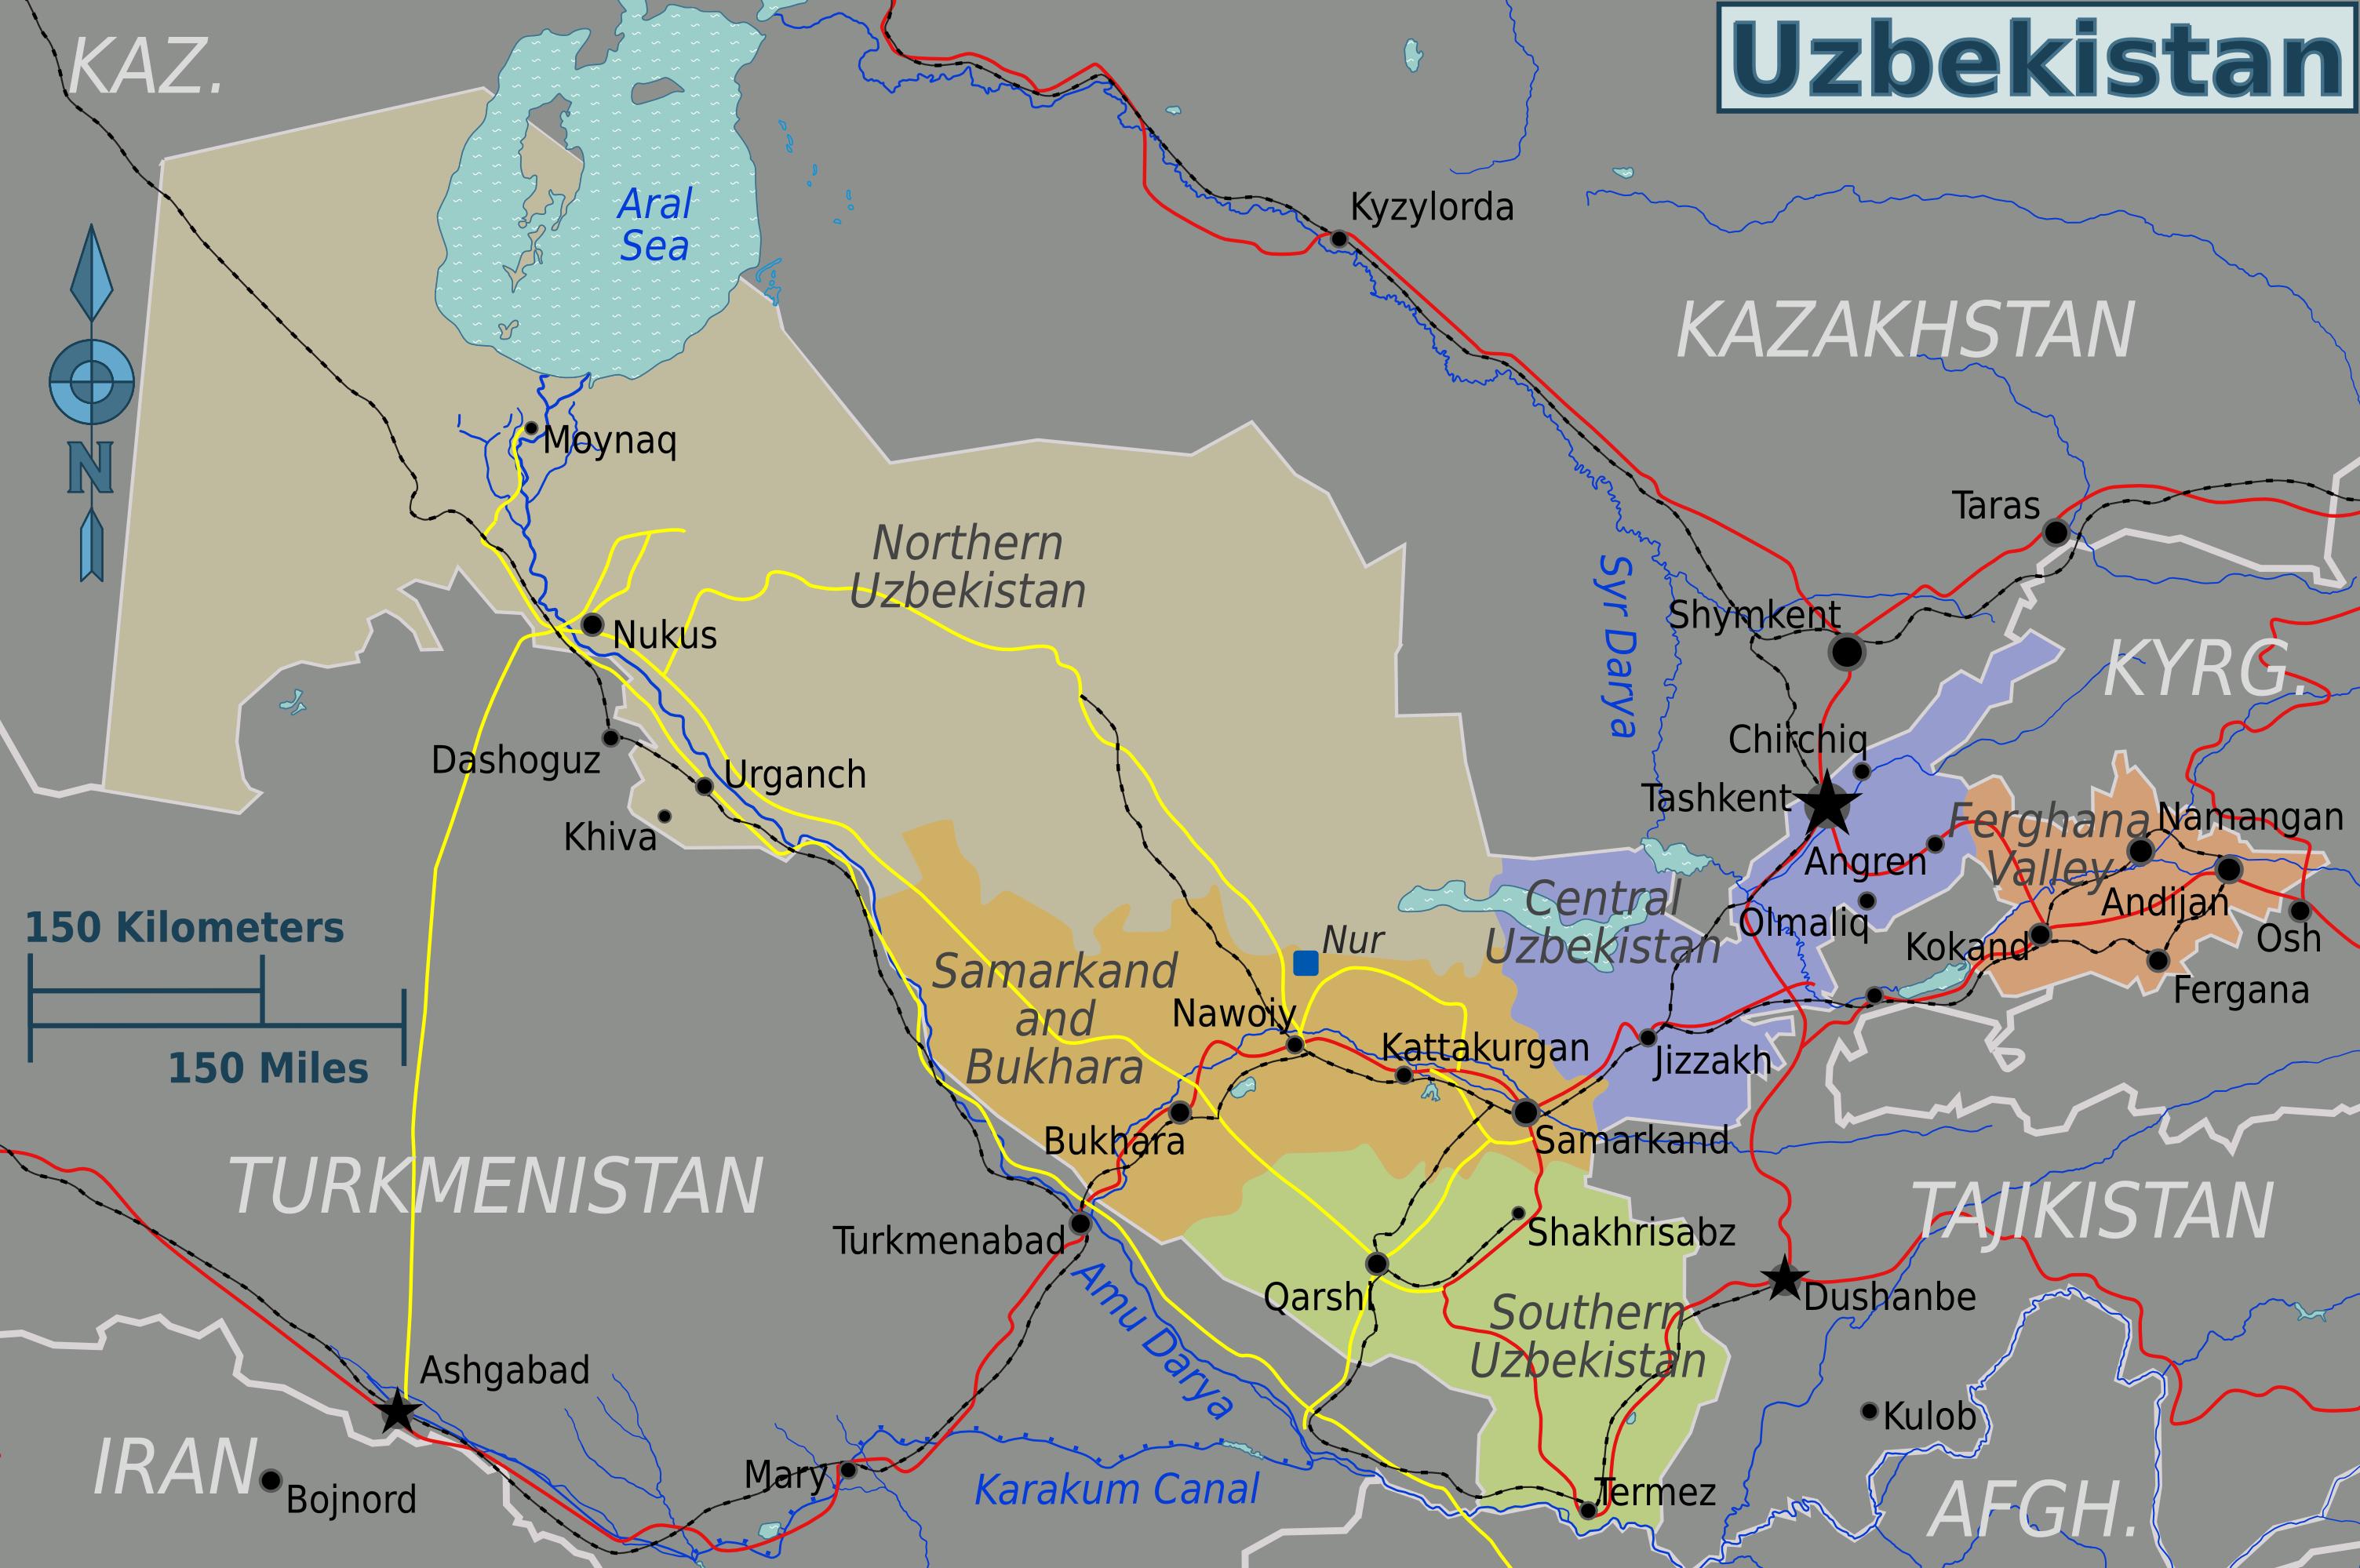 Map Of Uzbekistan Regions Worldofmapsnet Online Maps And - Uzbekistan interactive map